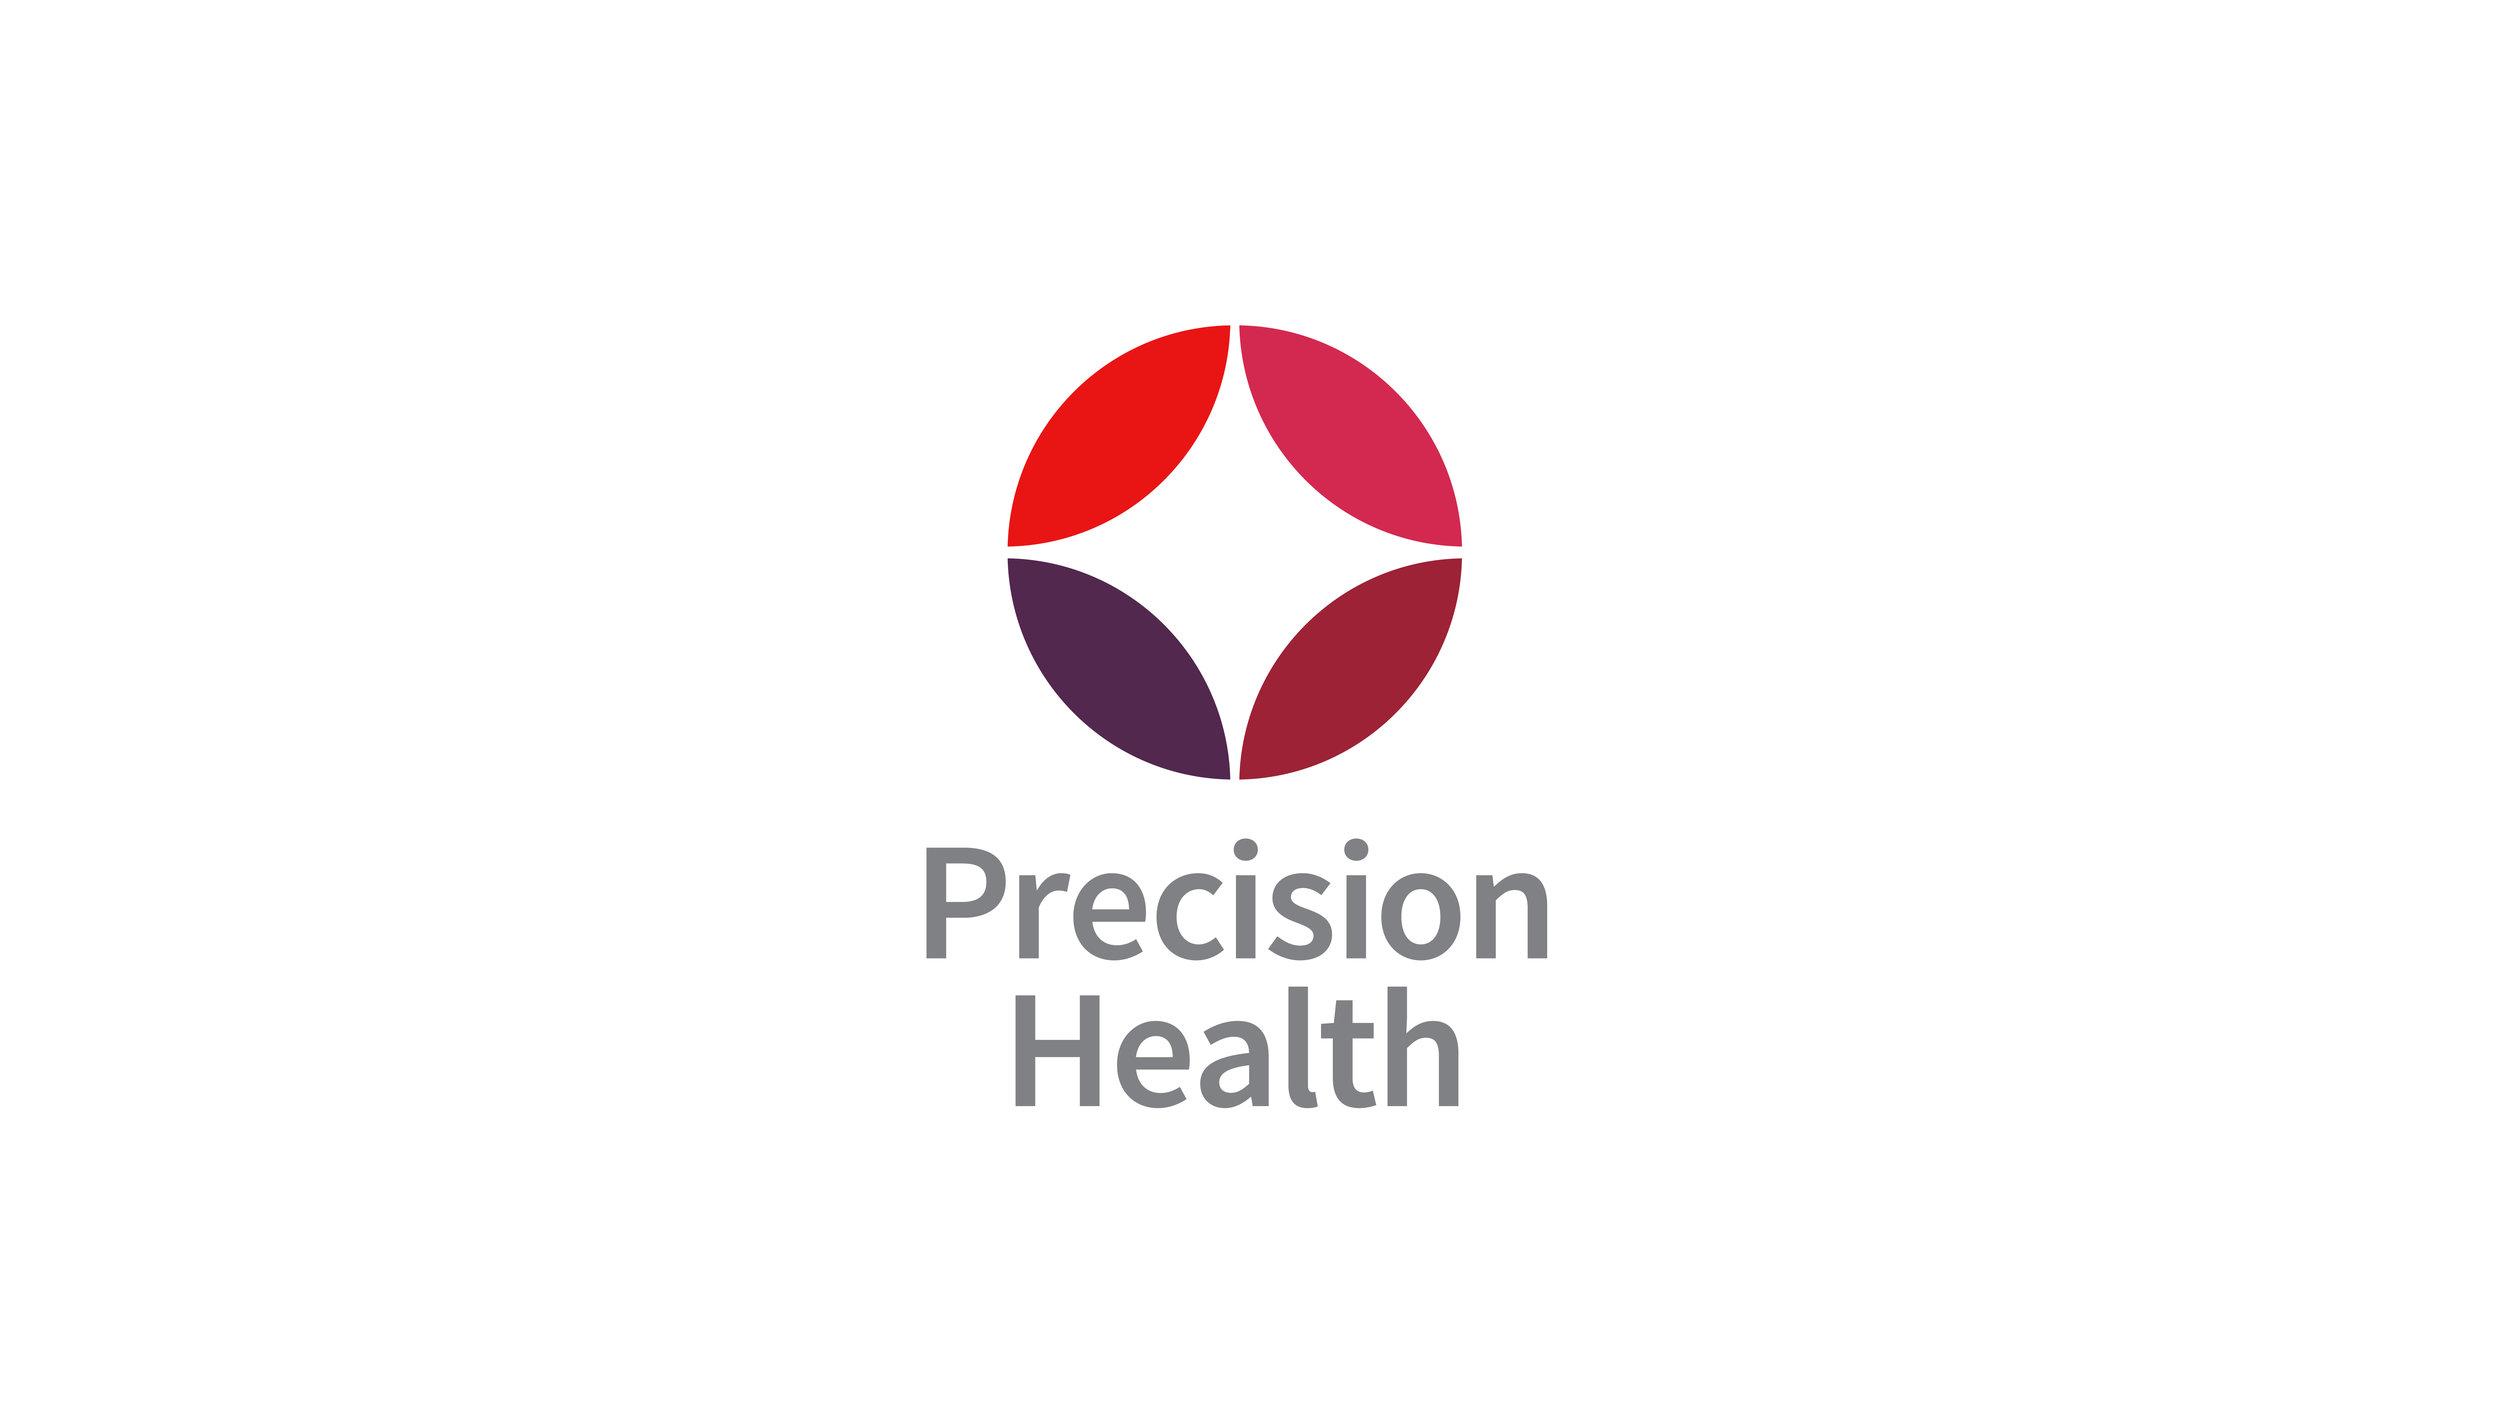 PrecisionHealth_01-01.jpg